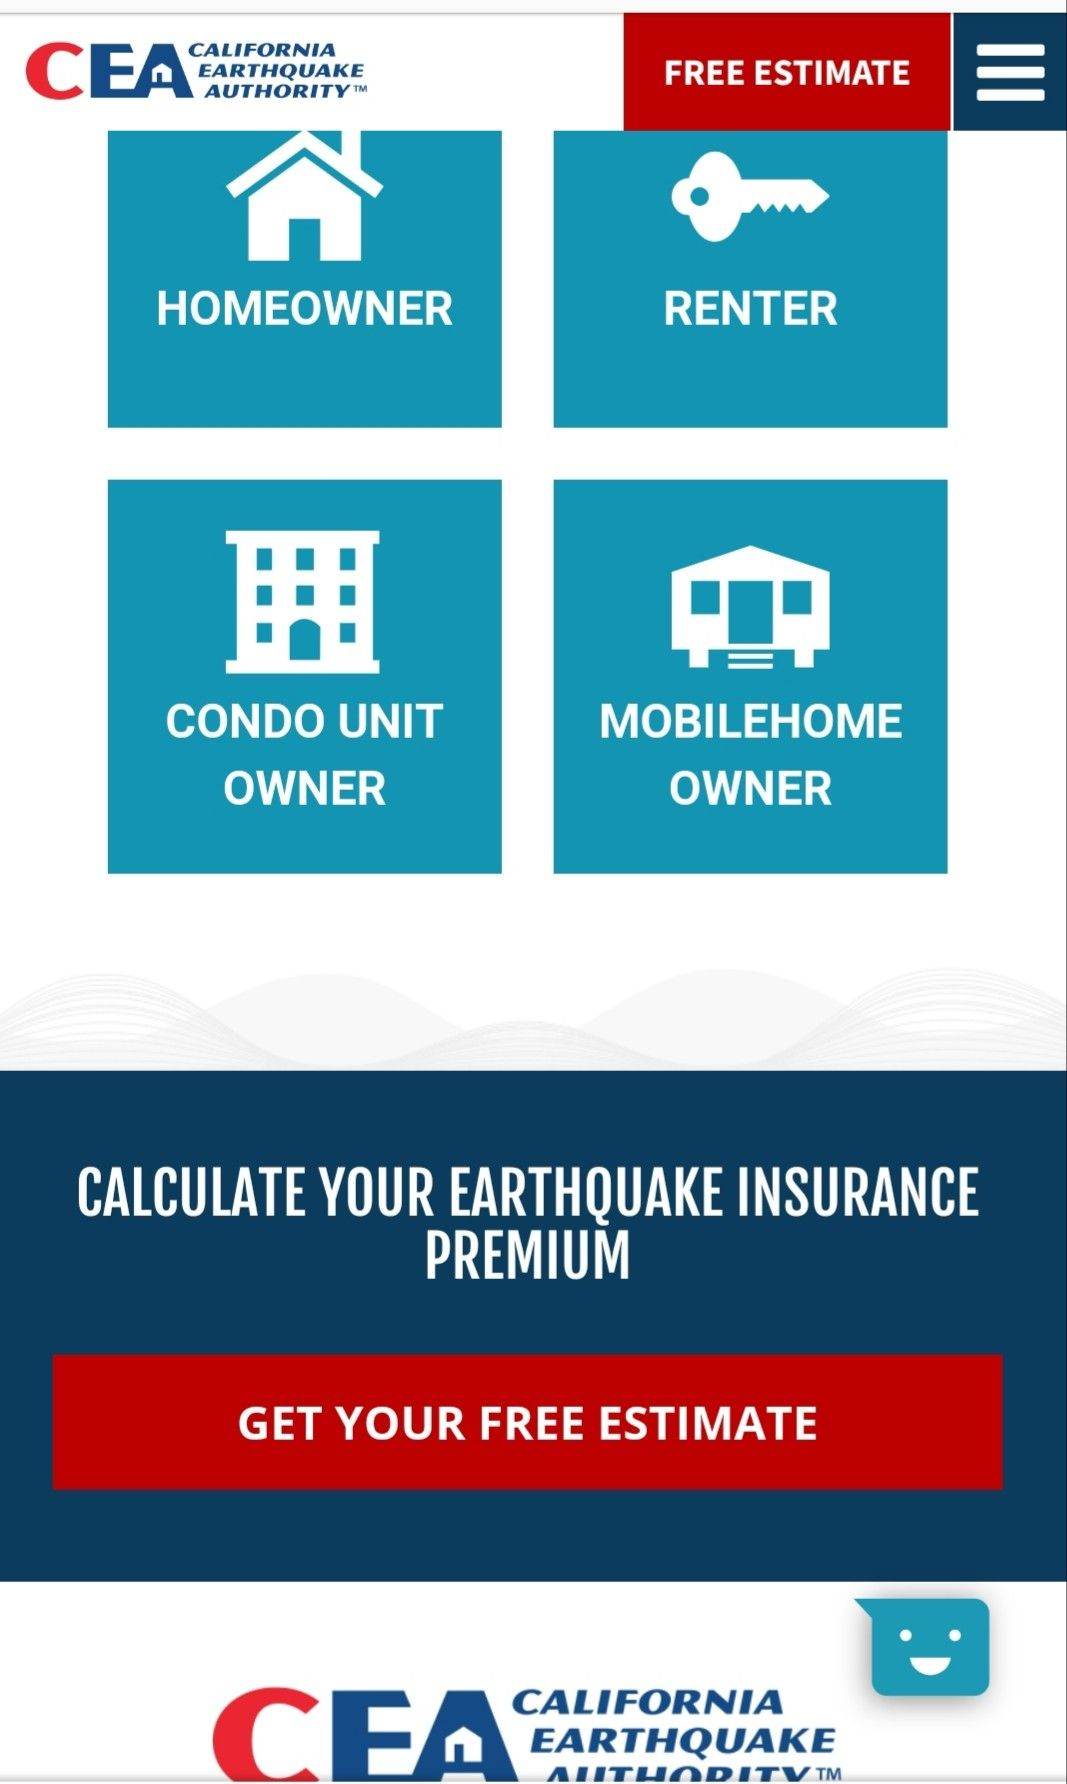 Earthquake Insurance State Farm Insurance State farm